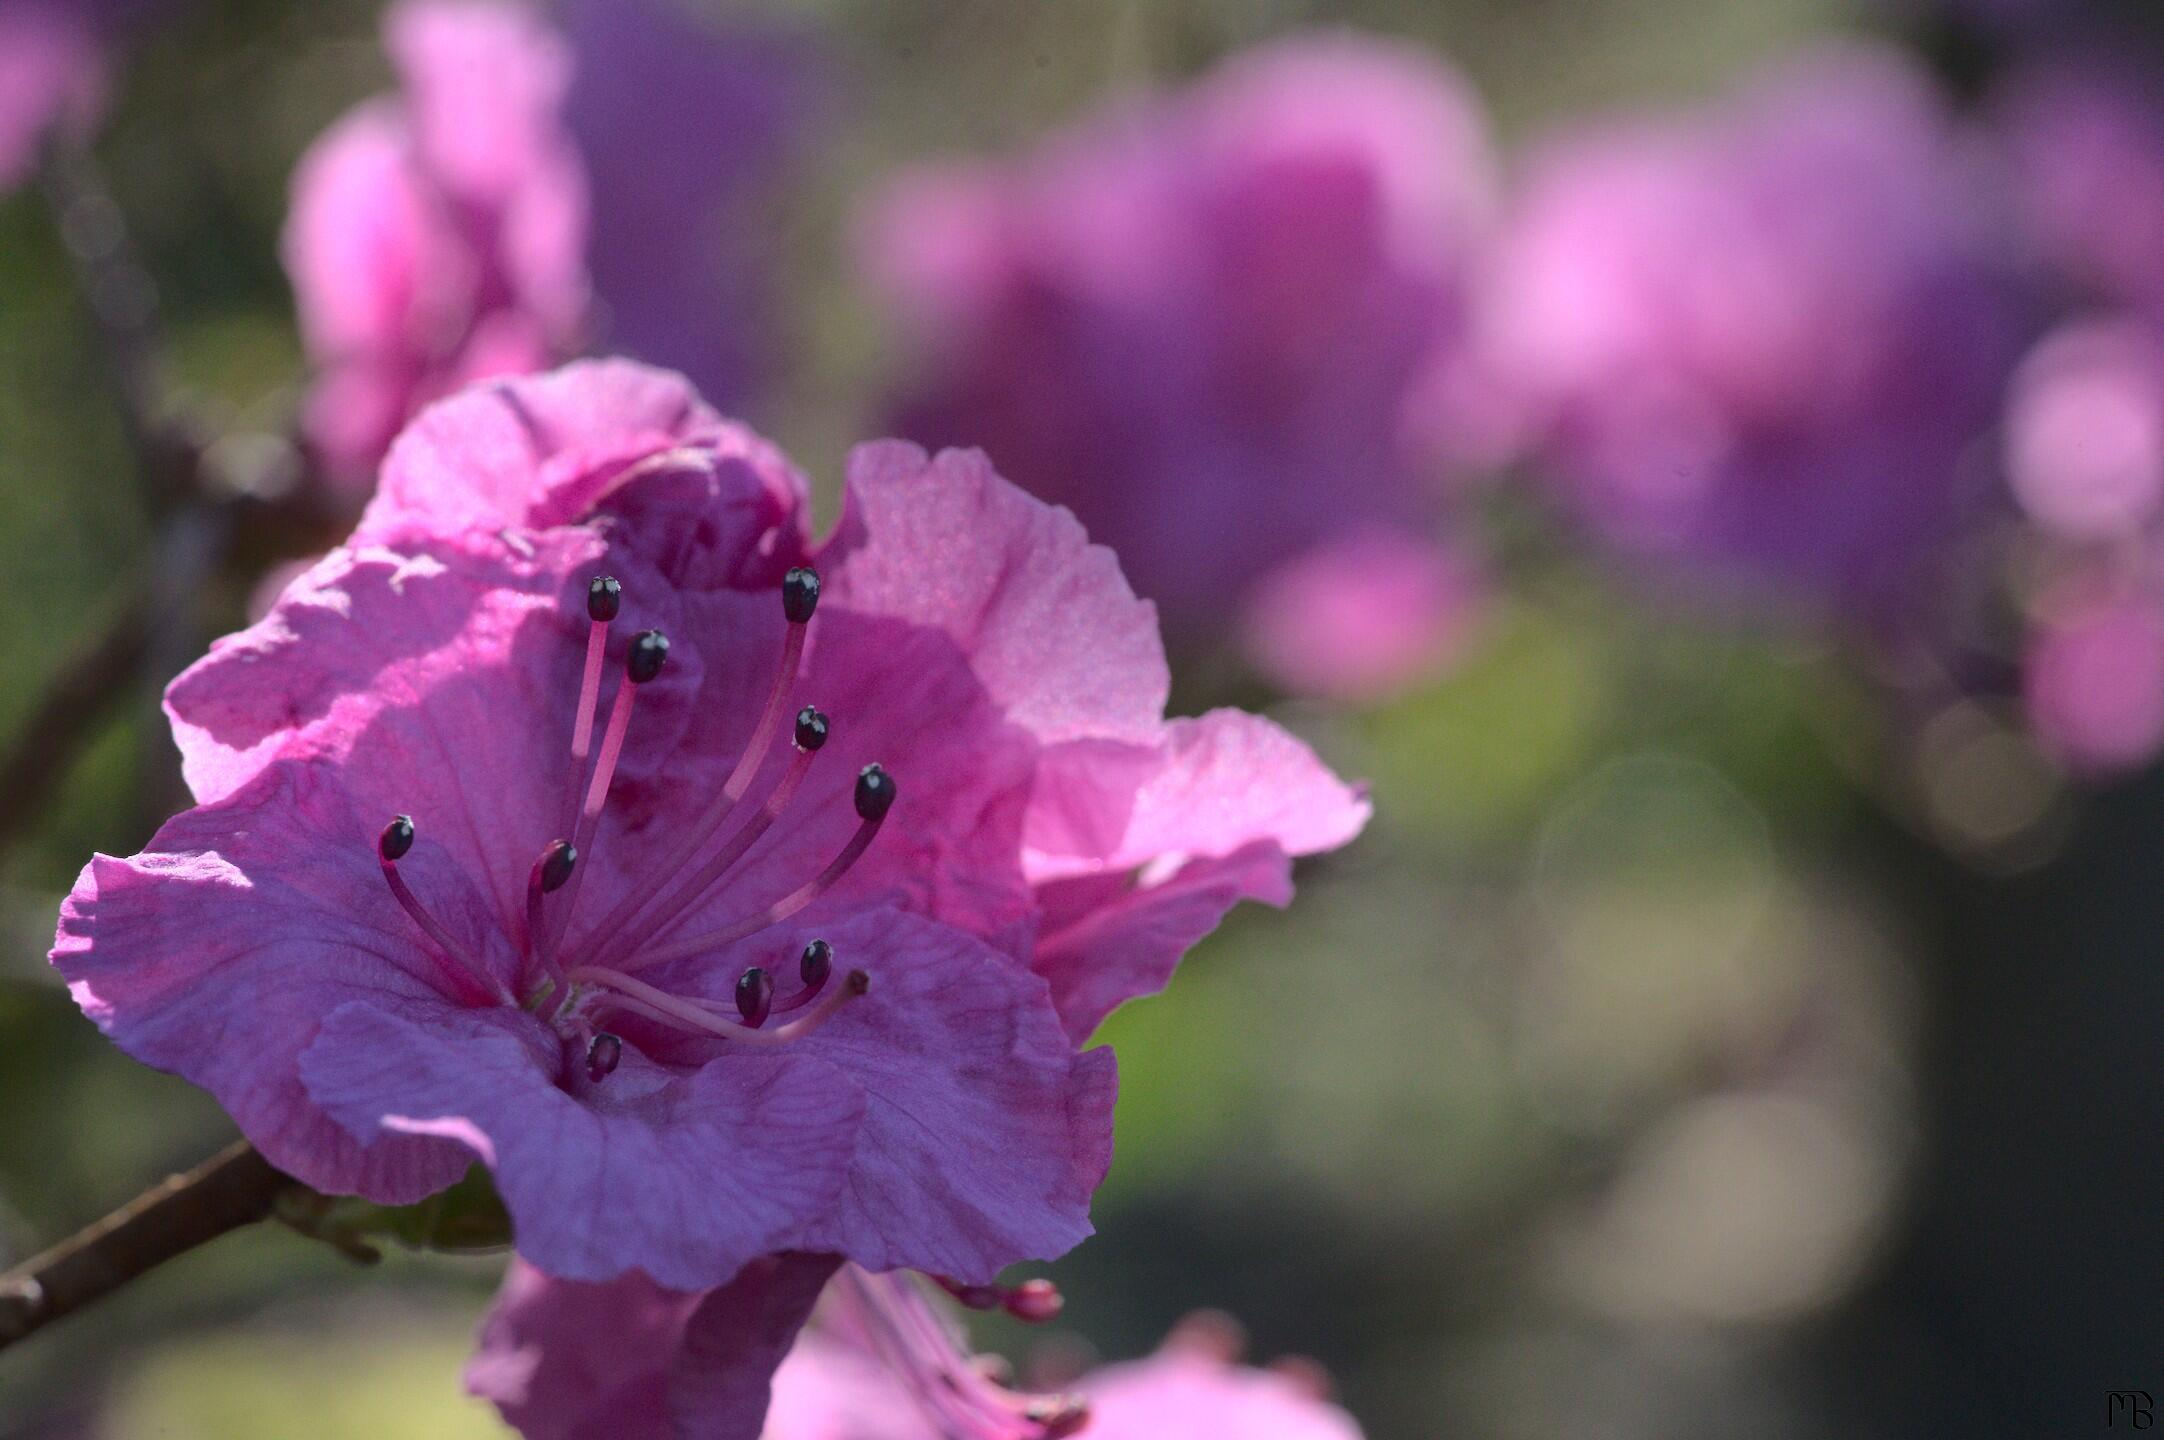 Pink flower on branch